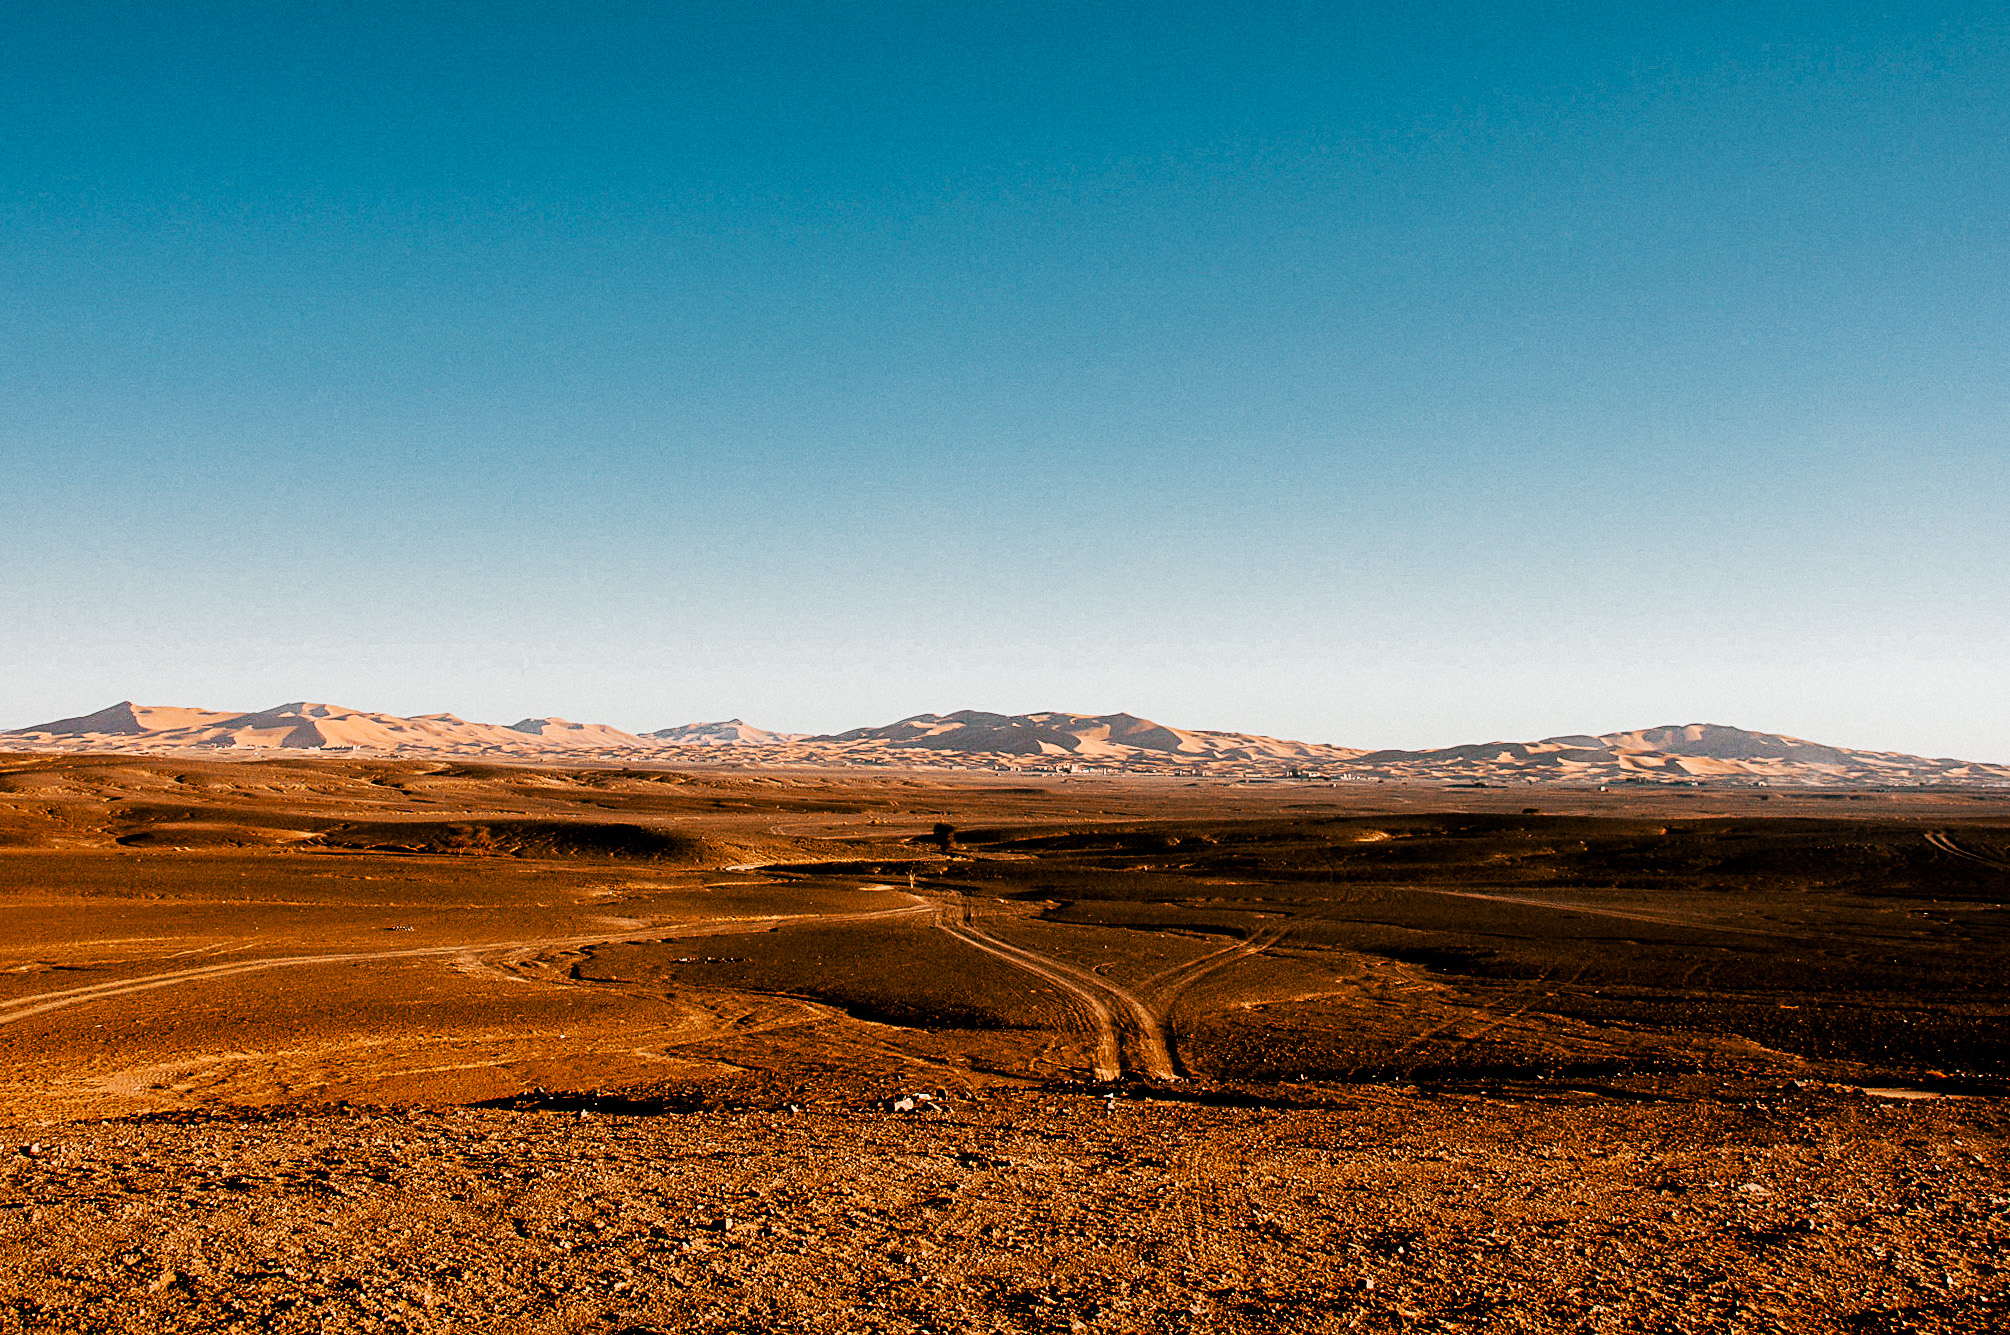 Approaching the Sahara desert.